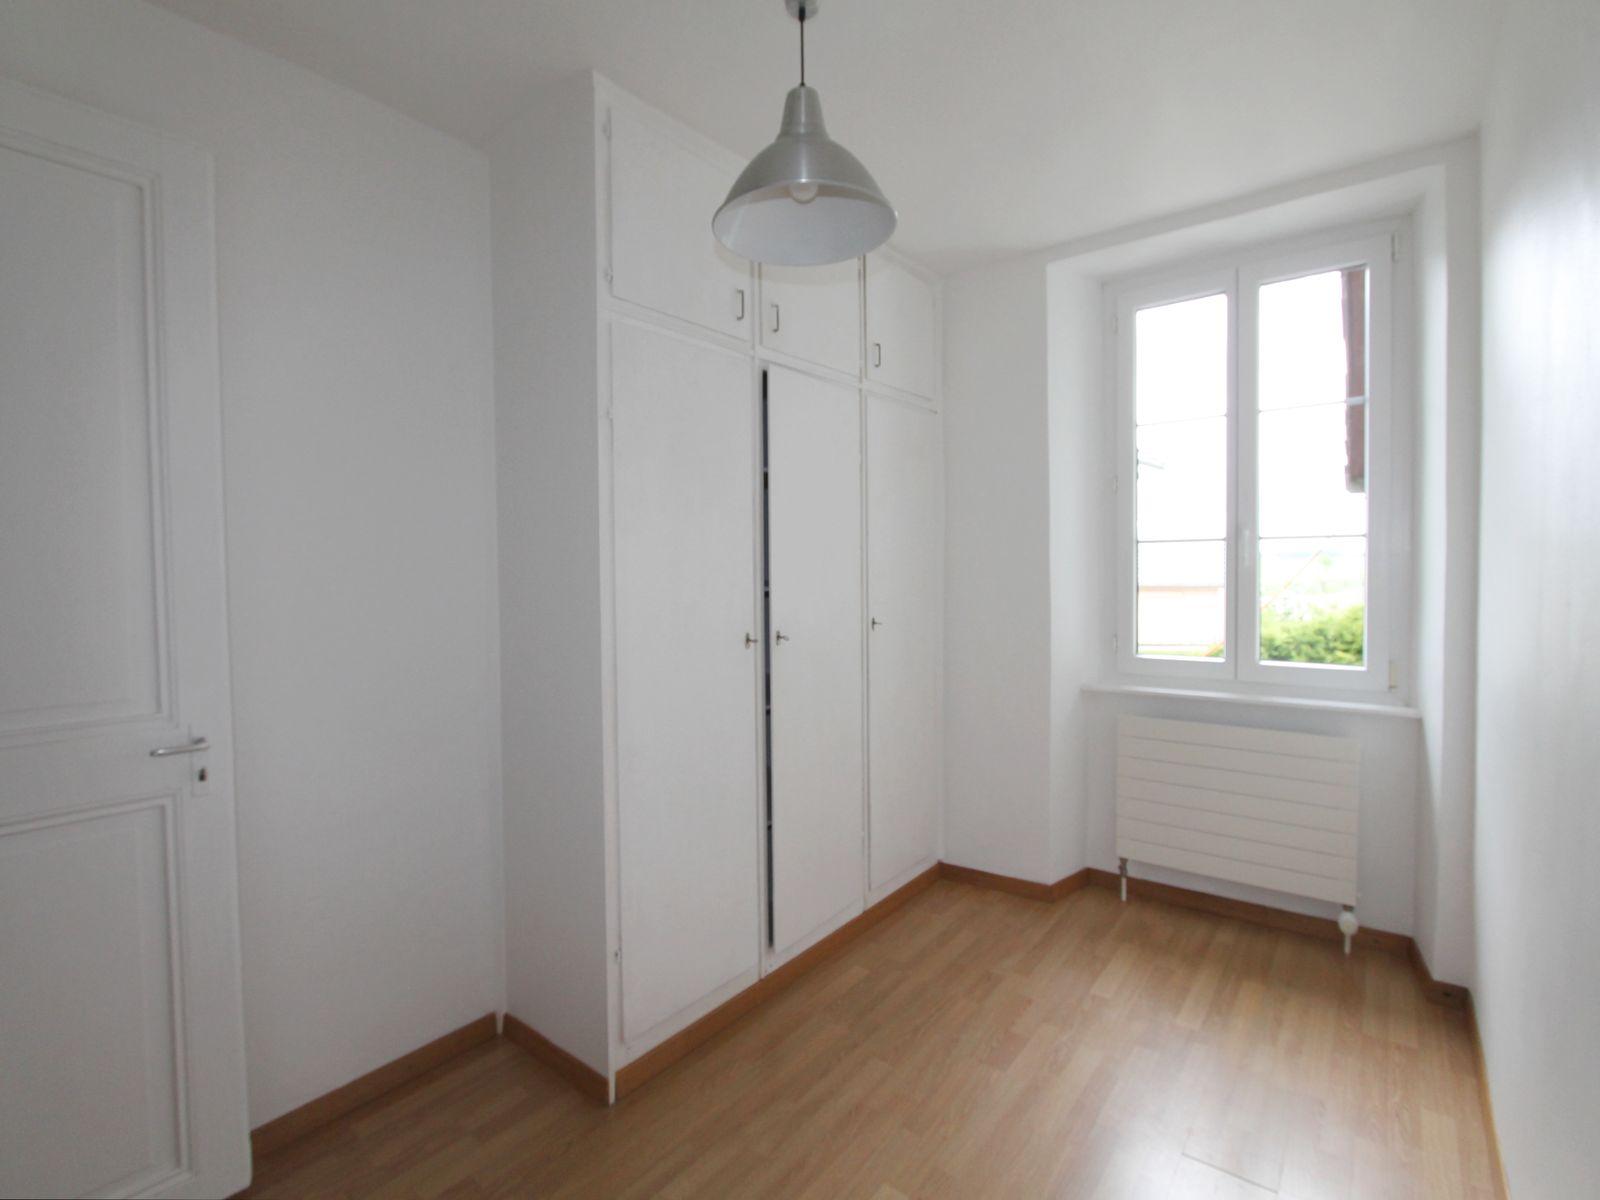 Petite chambre avec placard